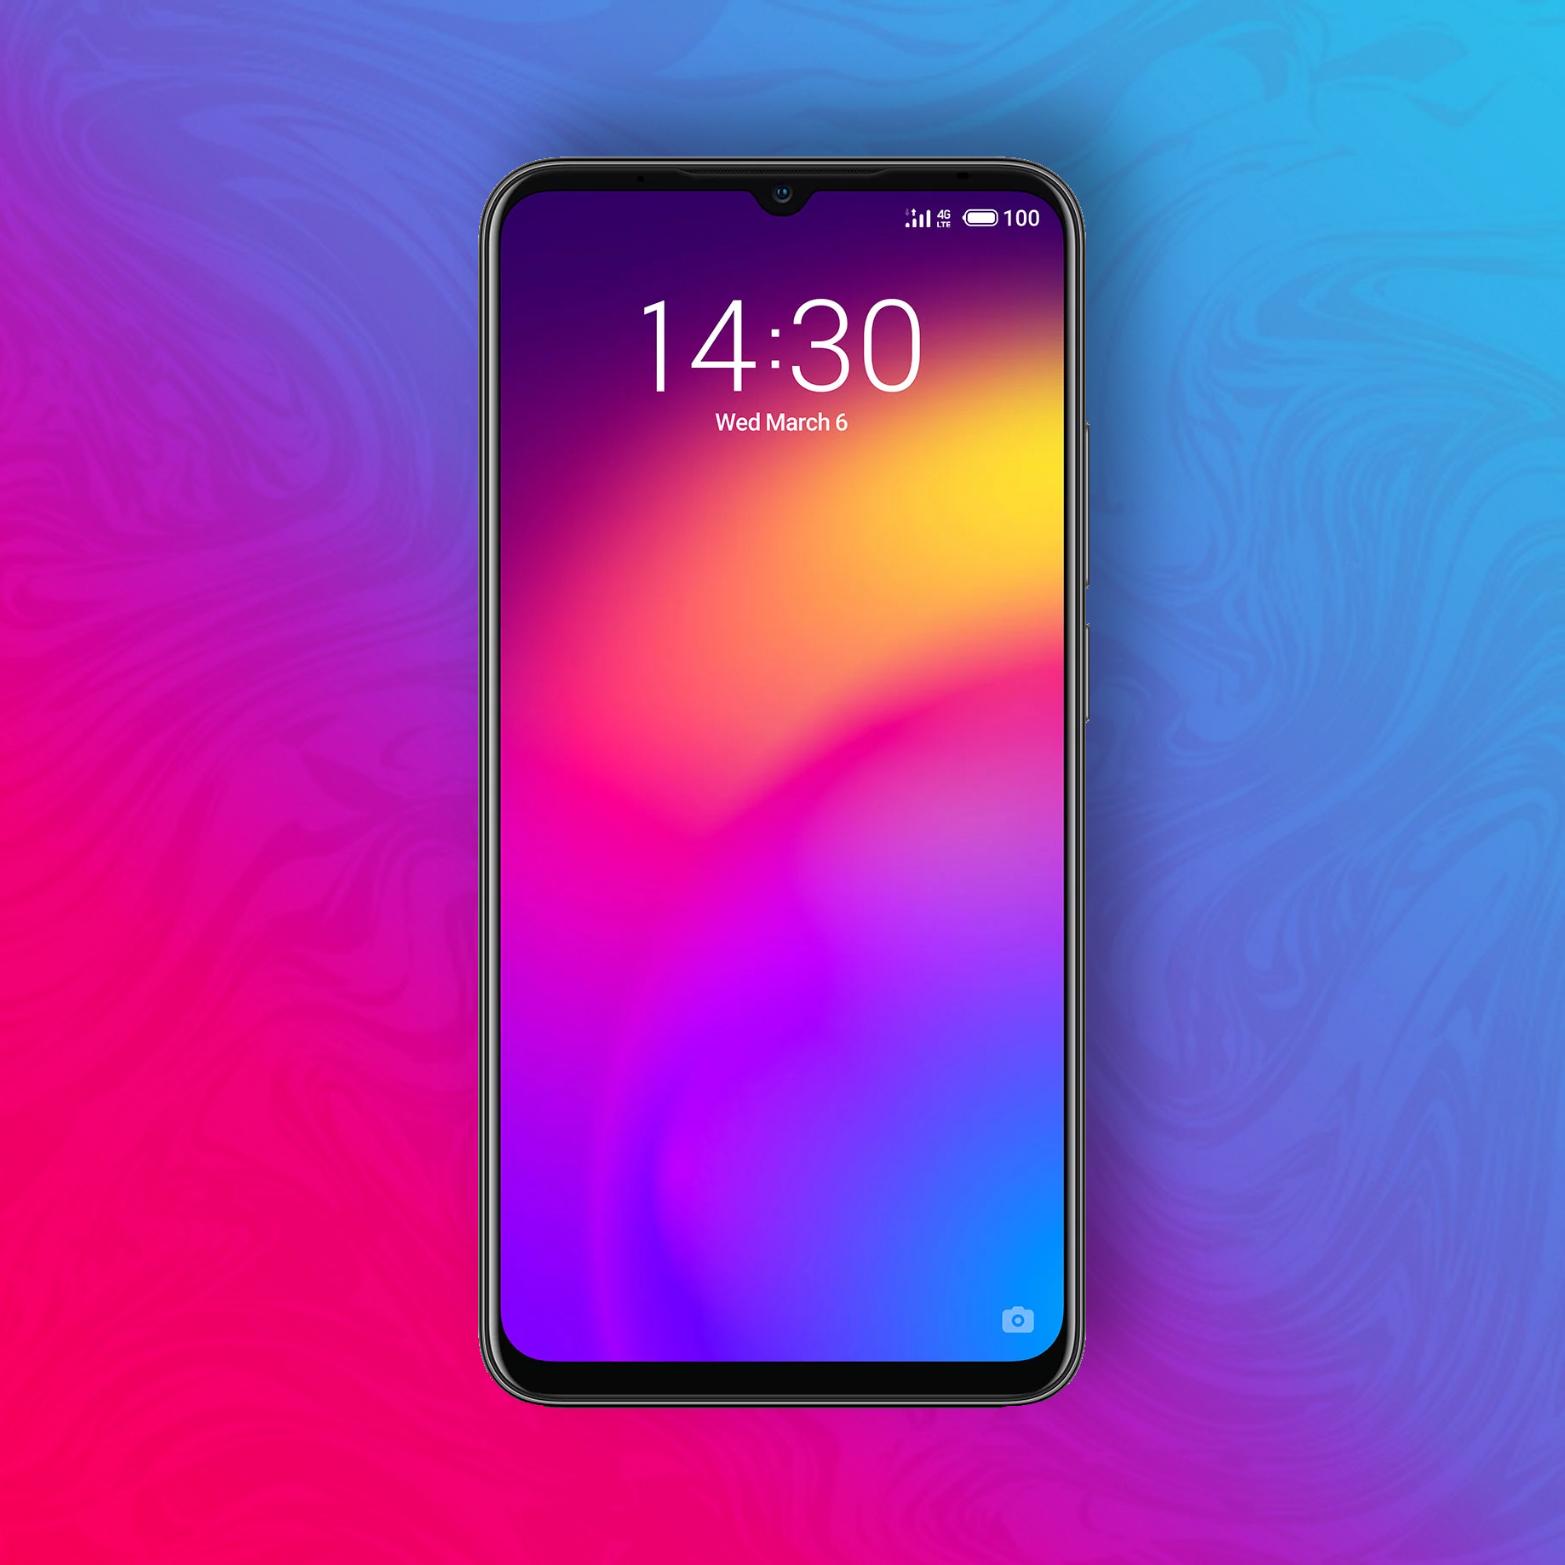 Meizu Note 9 64/4GB - Snapdragon 675 - 48MP+5 MP - 4000mAh Akku | Global Version mit B20